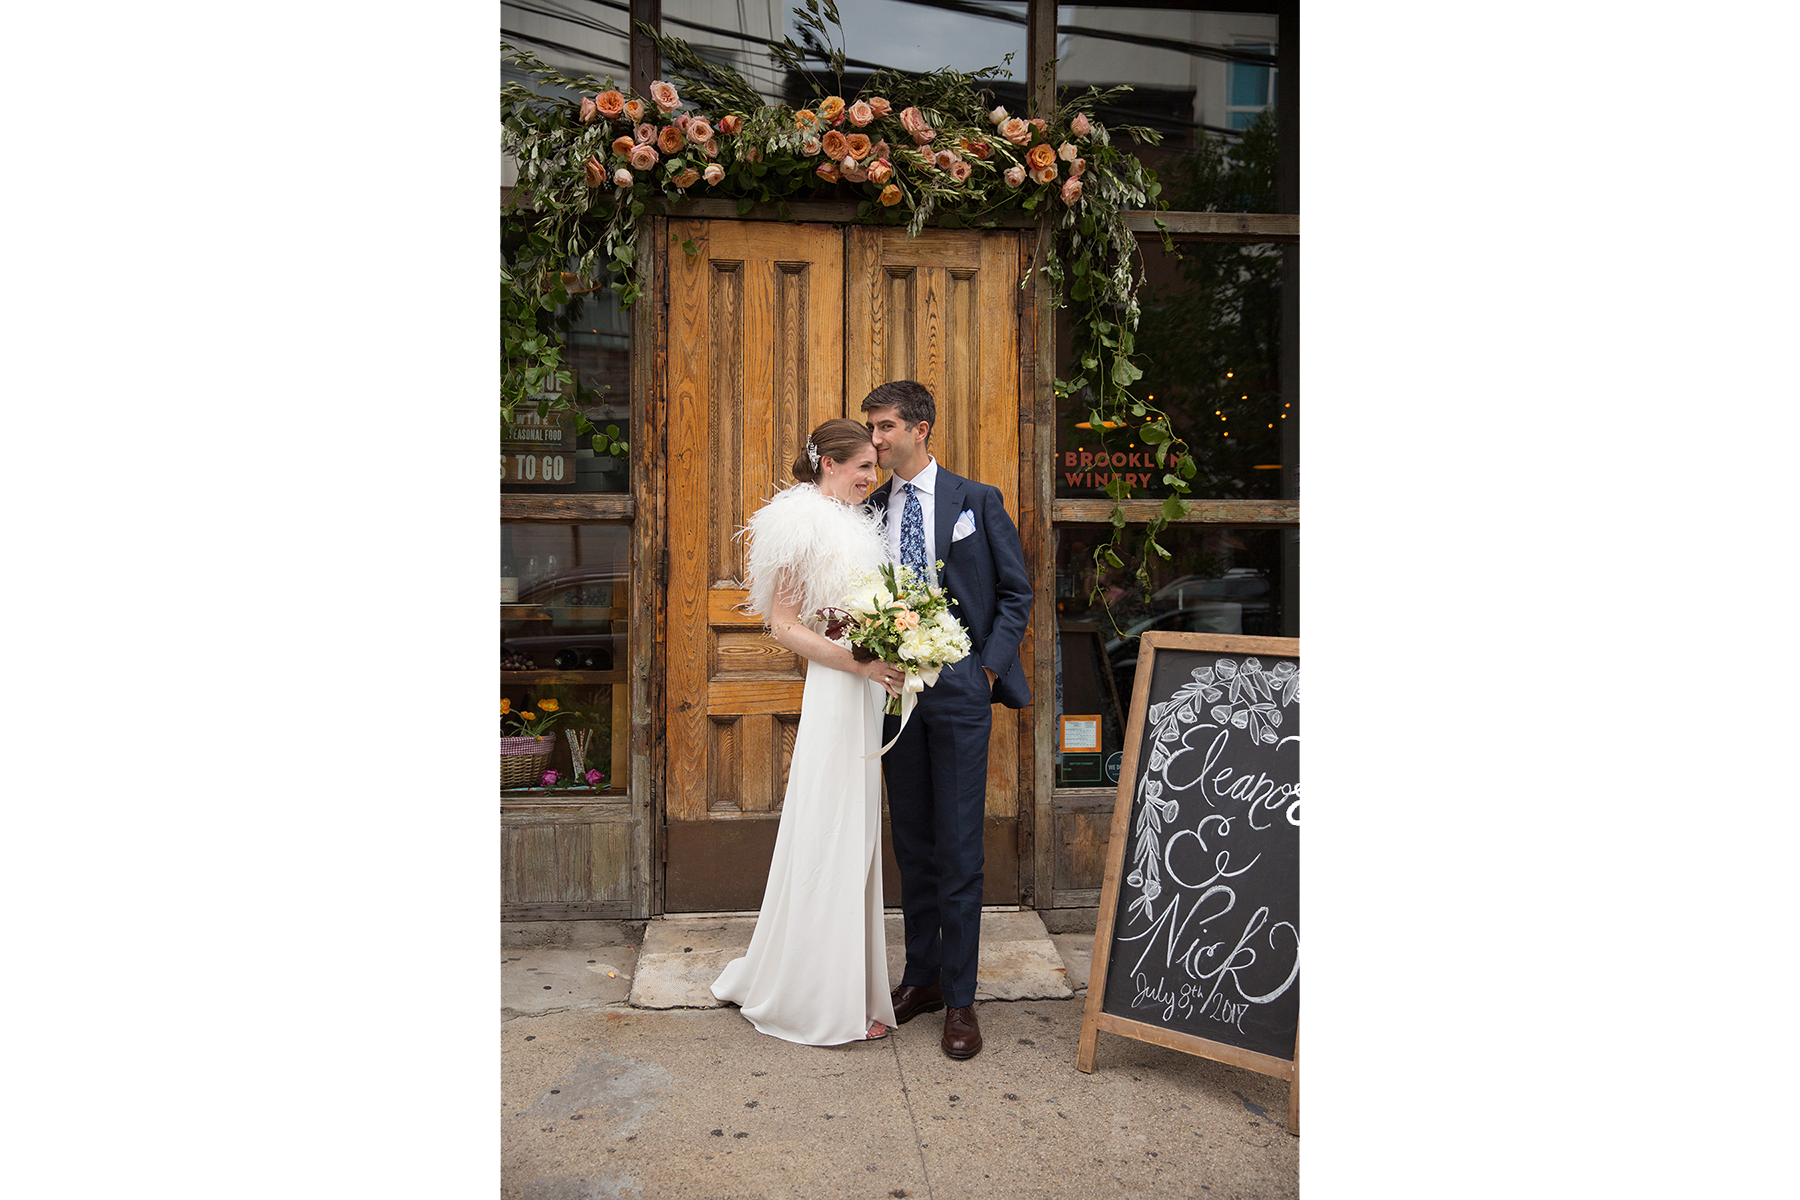 raquelreis_wedding_photography_brooklynwinery_036.png